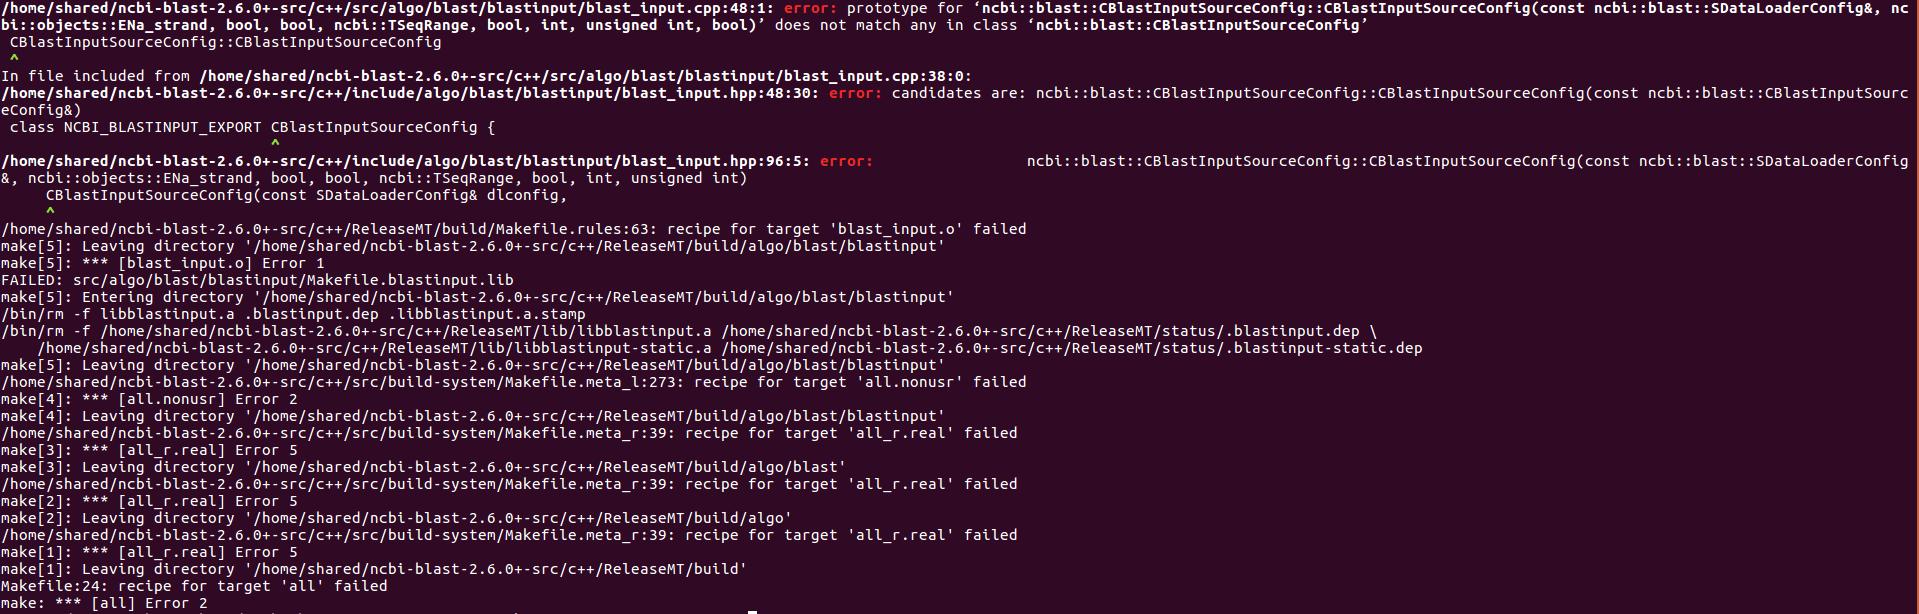 20180522_repeatmasker_make_error_01.png